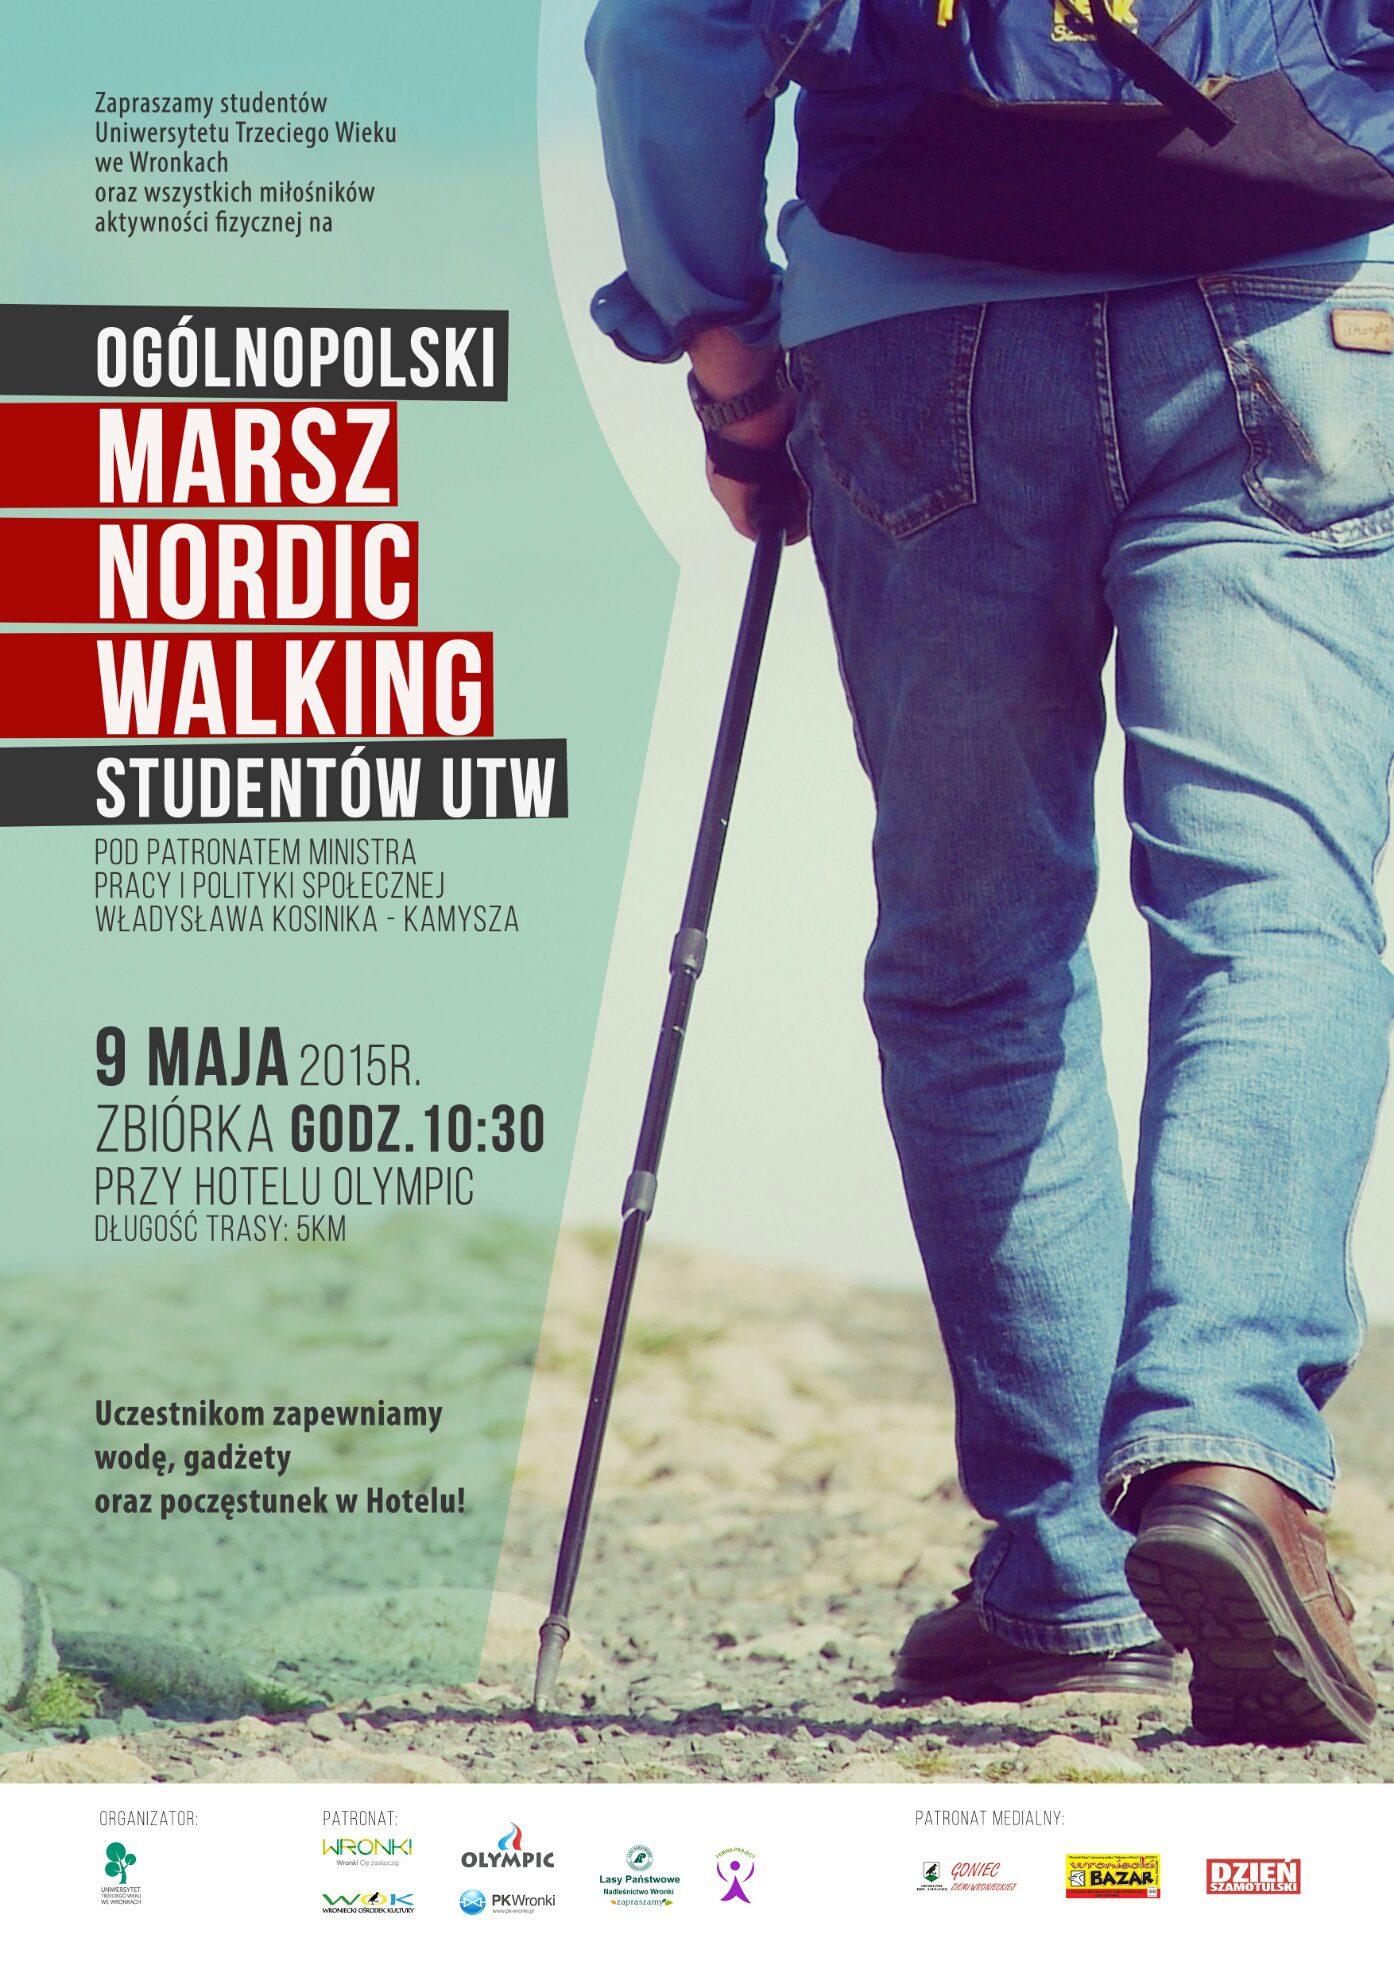 28_04_15_rajd nordic walking studentów UTW plakat_20150428213340731